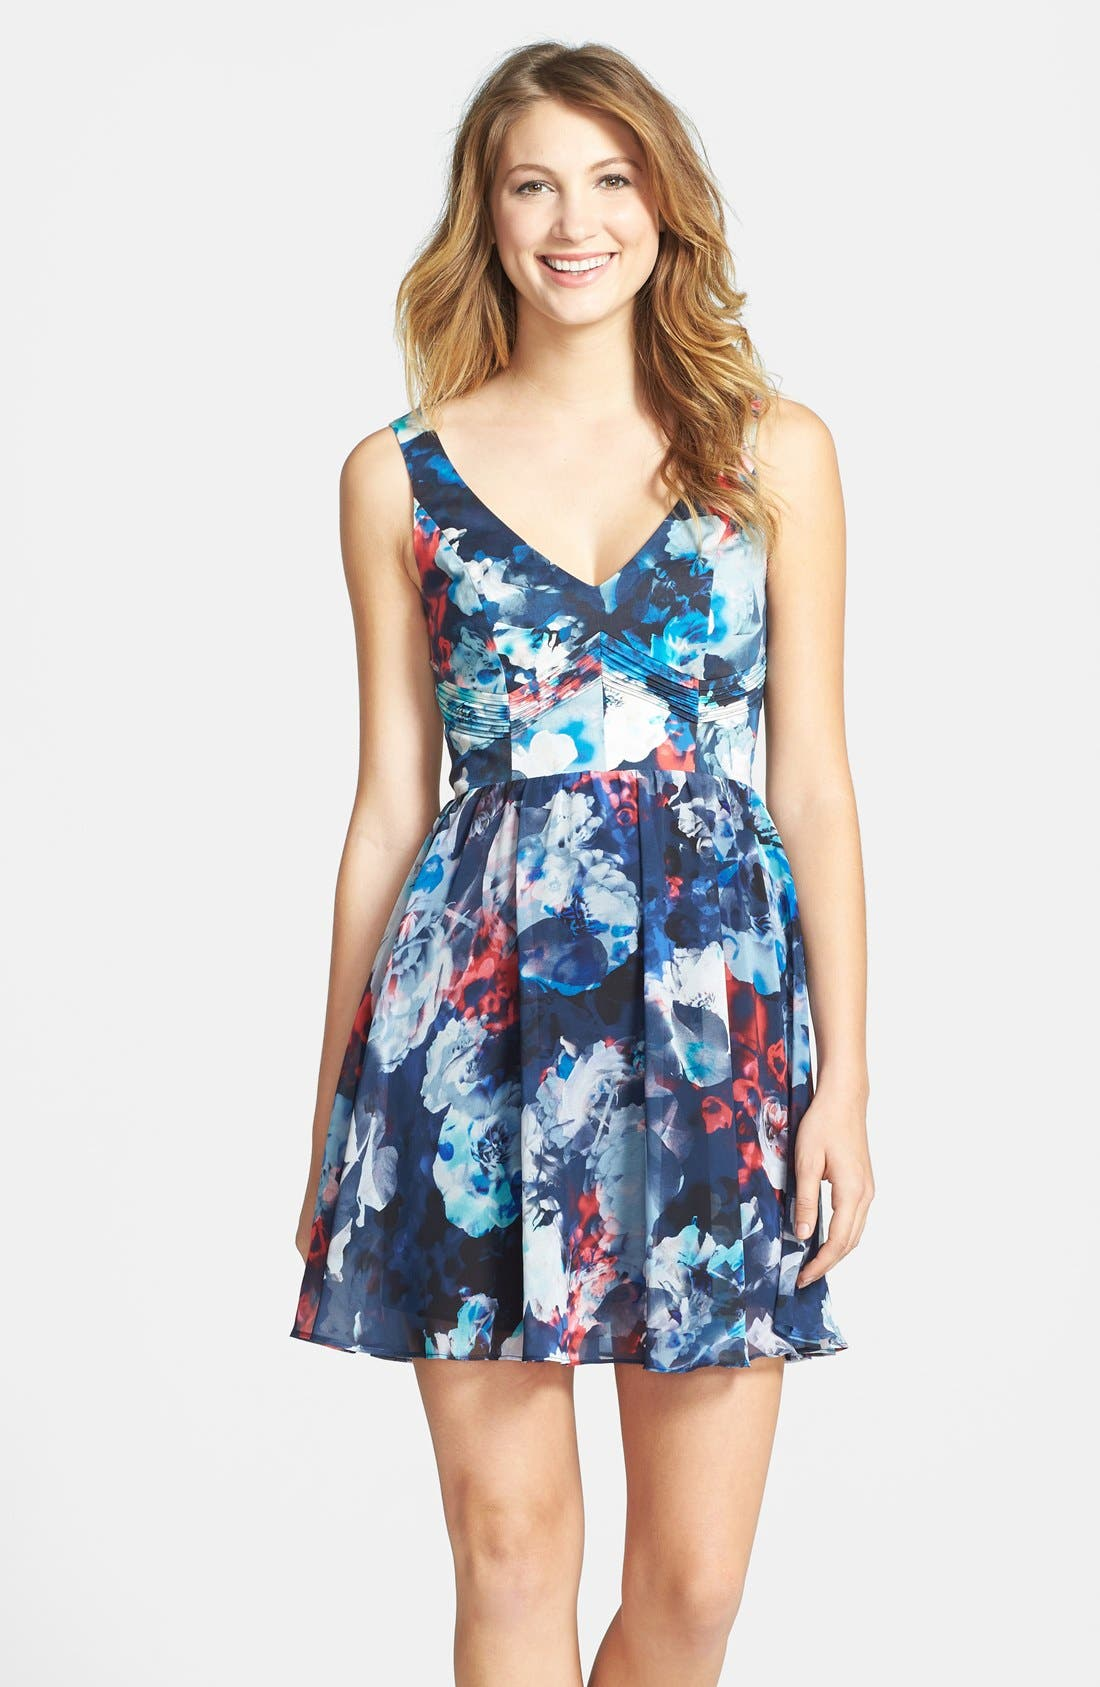 Alternate Image 1 Selected - Bardot Floral Print Fit & Flare Dress (Nordstrom Exclusive)